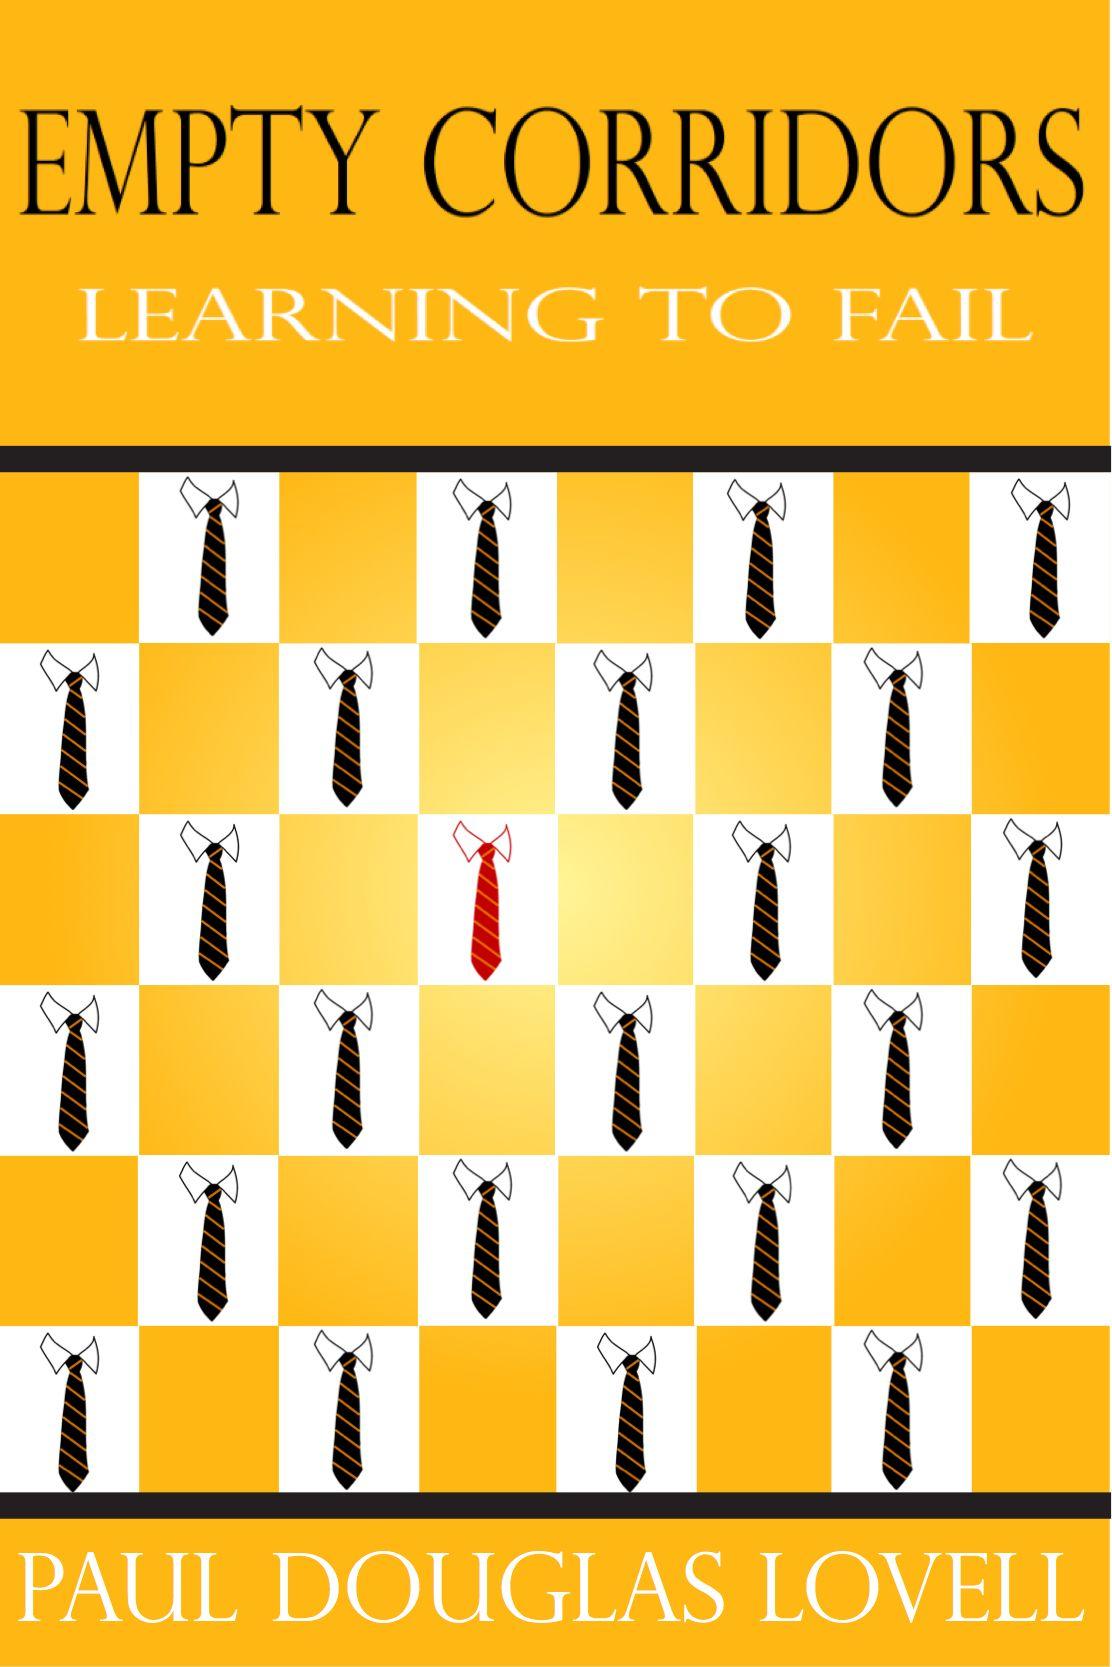 Empty Corridors Learning to Fail's Ebook Image